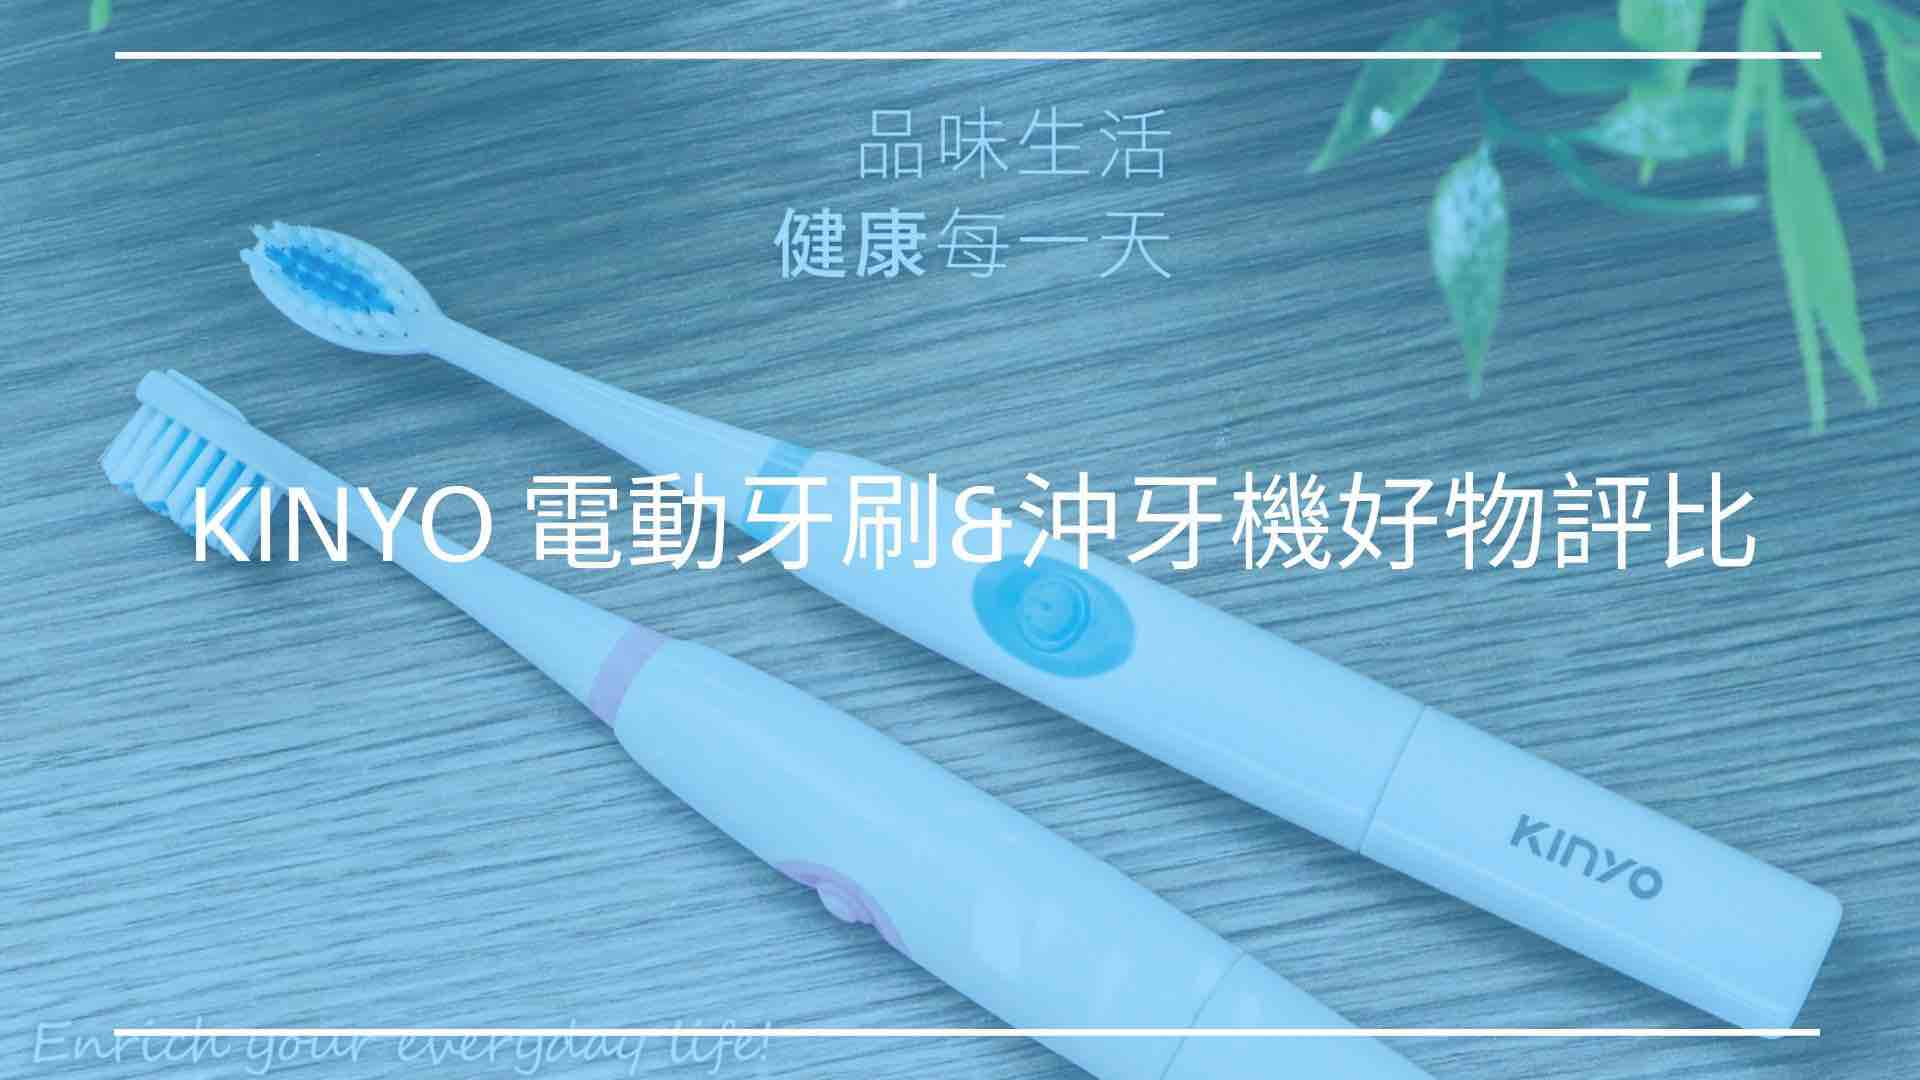 KINYO 電動牙刷&沖牙機好物推薦評比